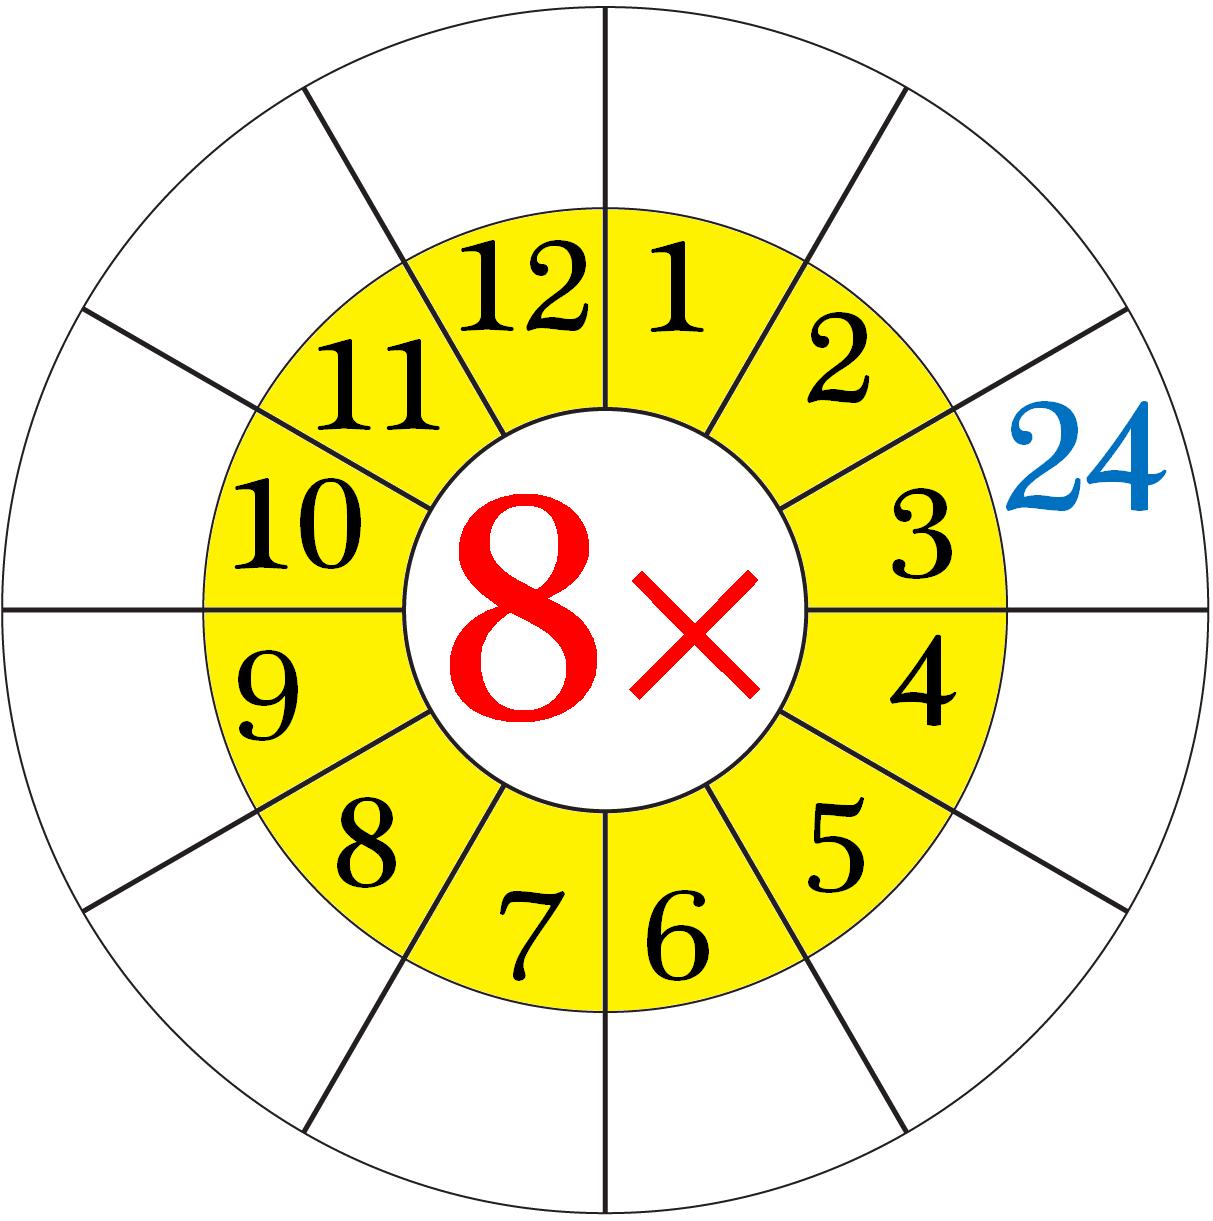 Worksheet On Multiplication Table Of   Word Problems On  Times Table Worksheet On Multiplication Table Of